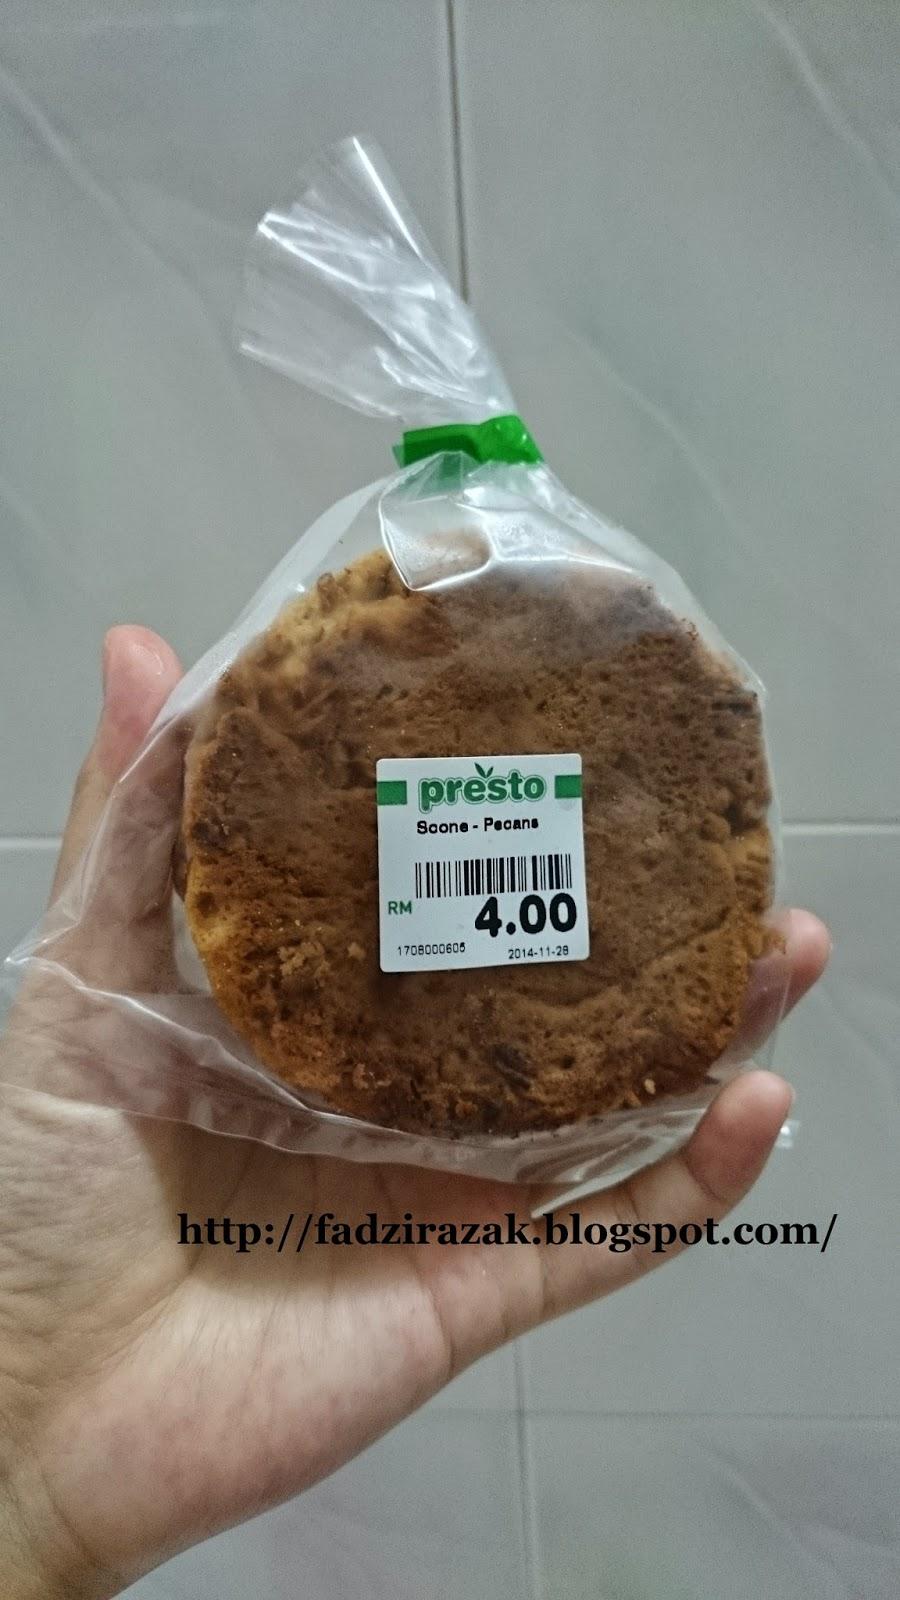 Scone Pecan Supermarket Presto